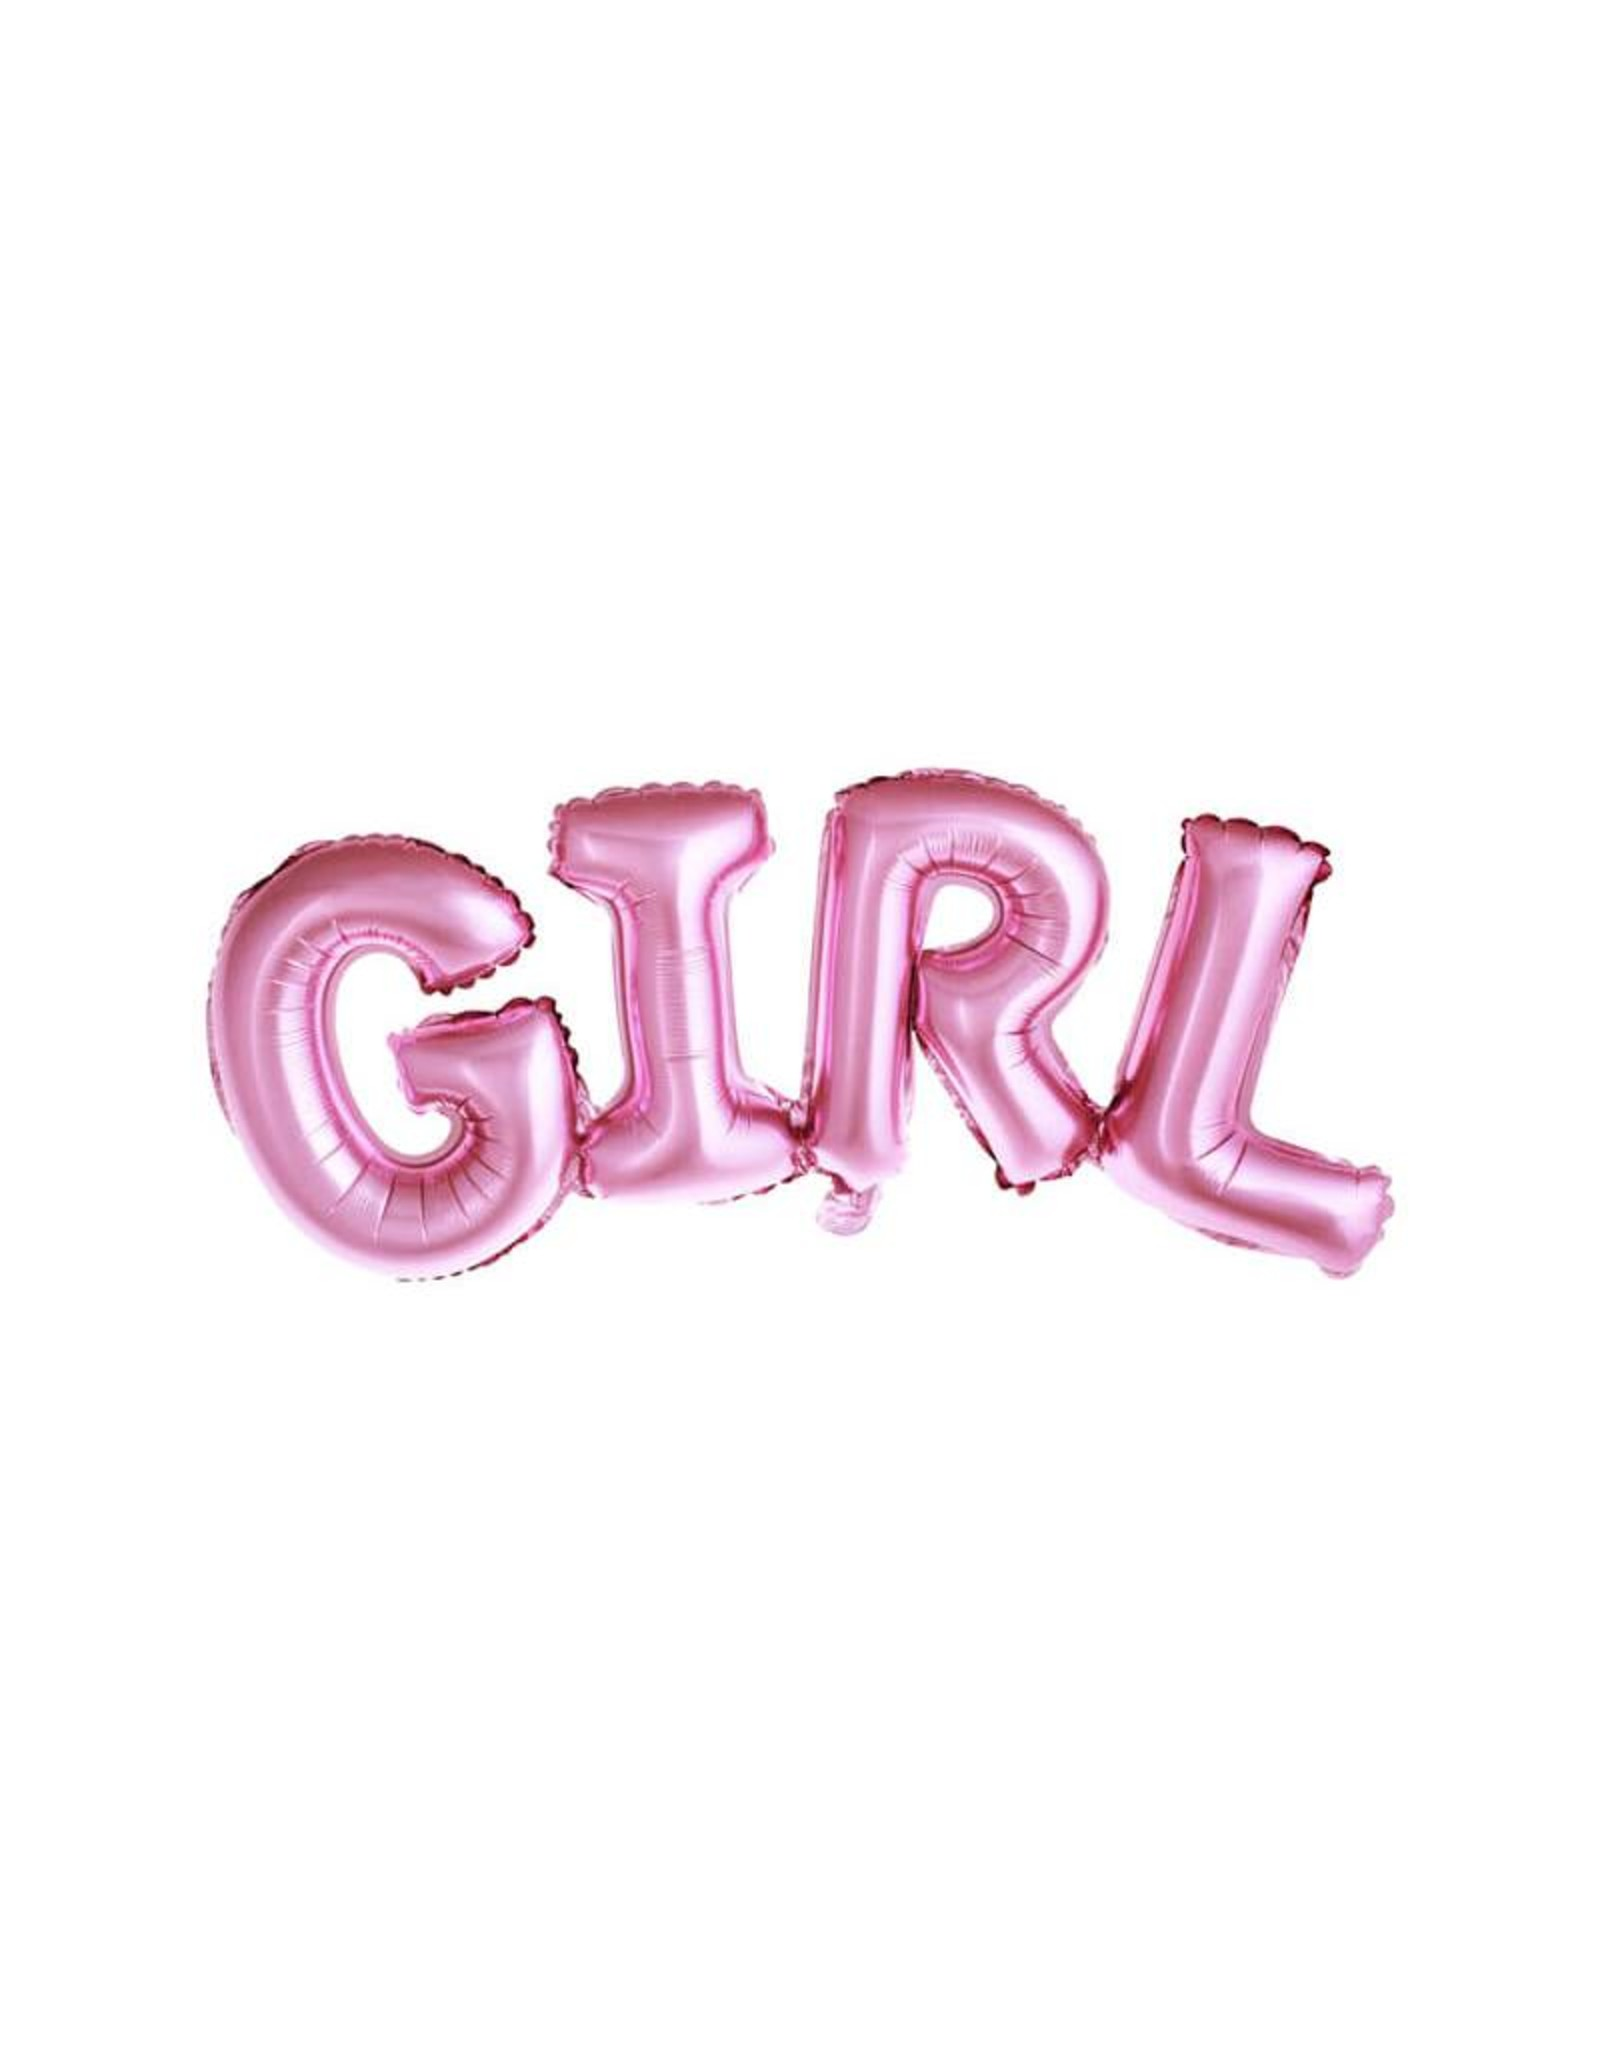 PartyDeco Folieballon 'Girl' roze